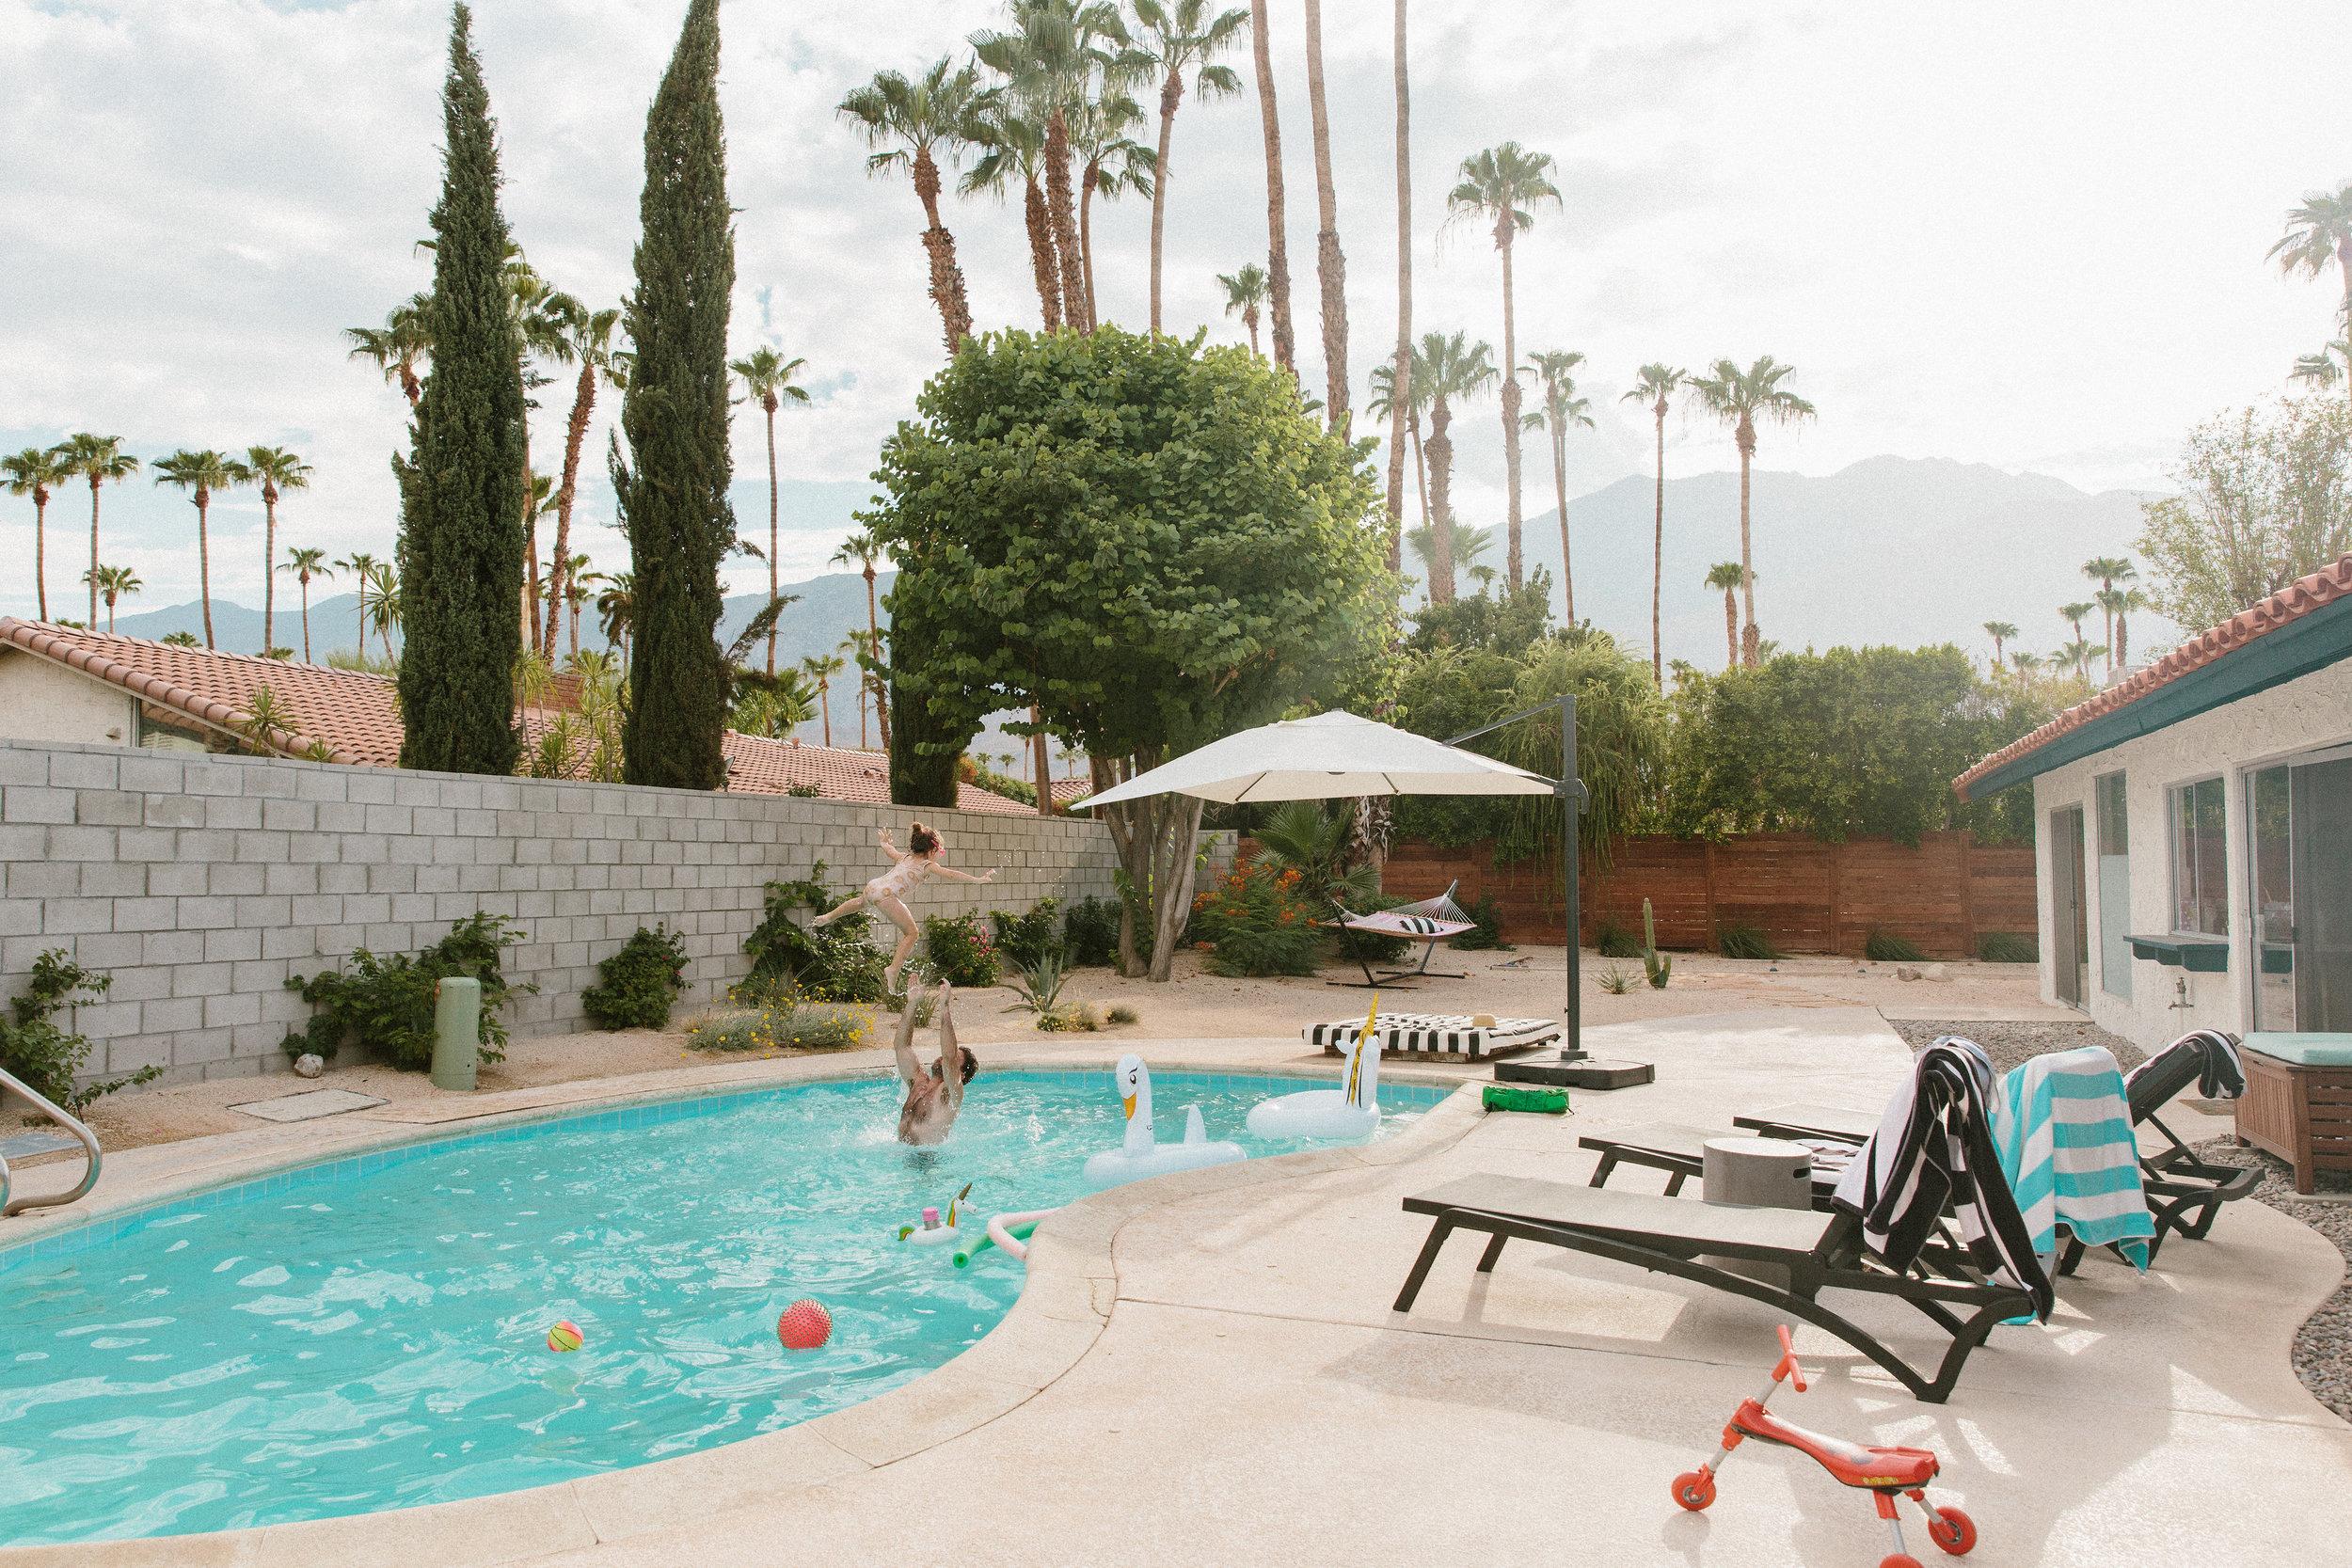 cami-palm-springs-2017-5.jpg